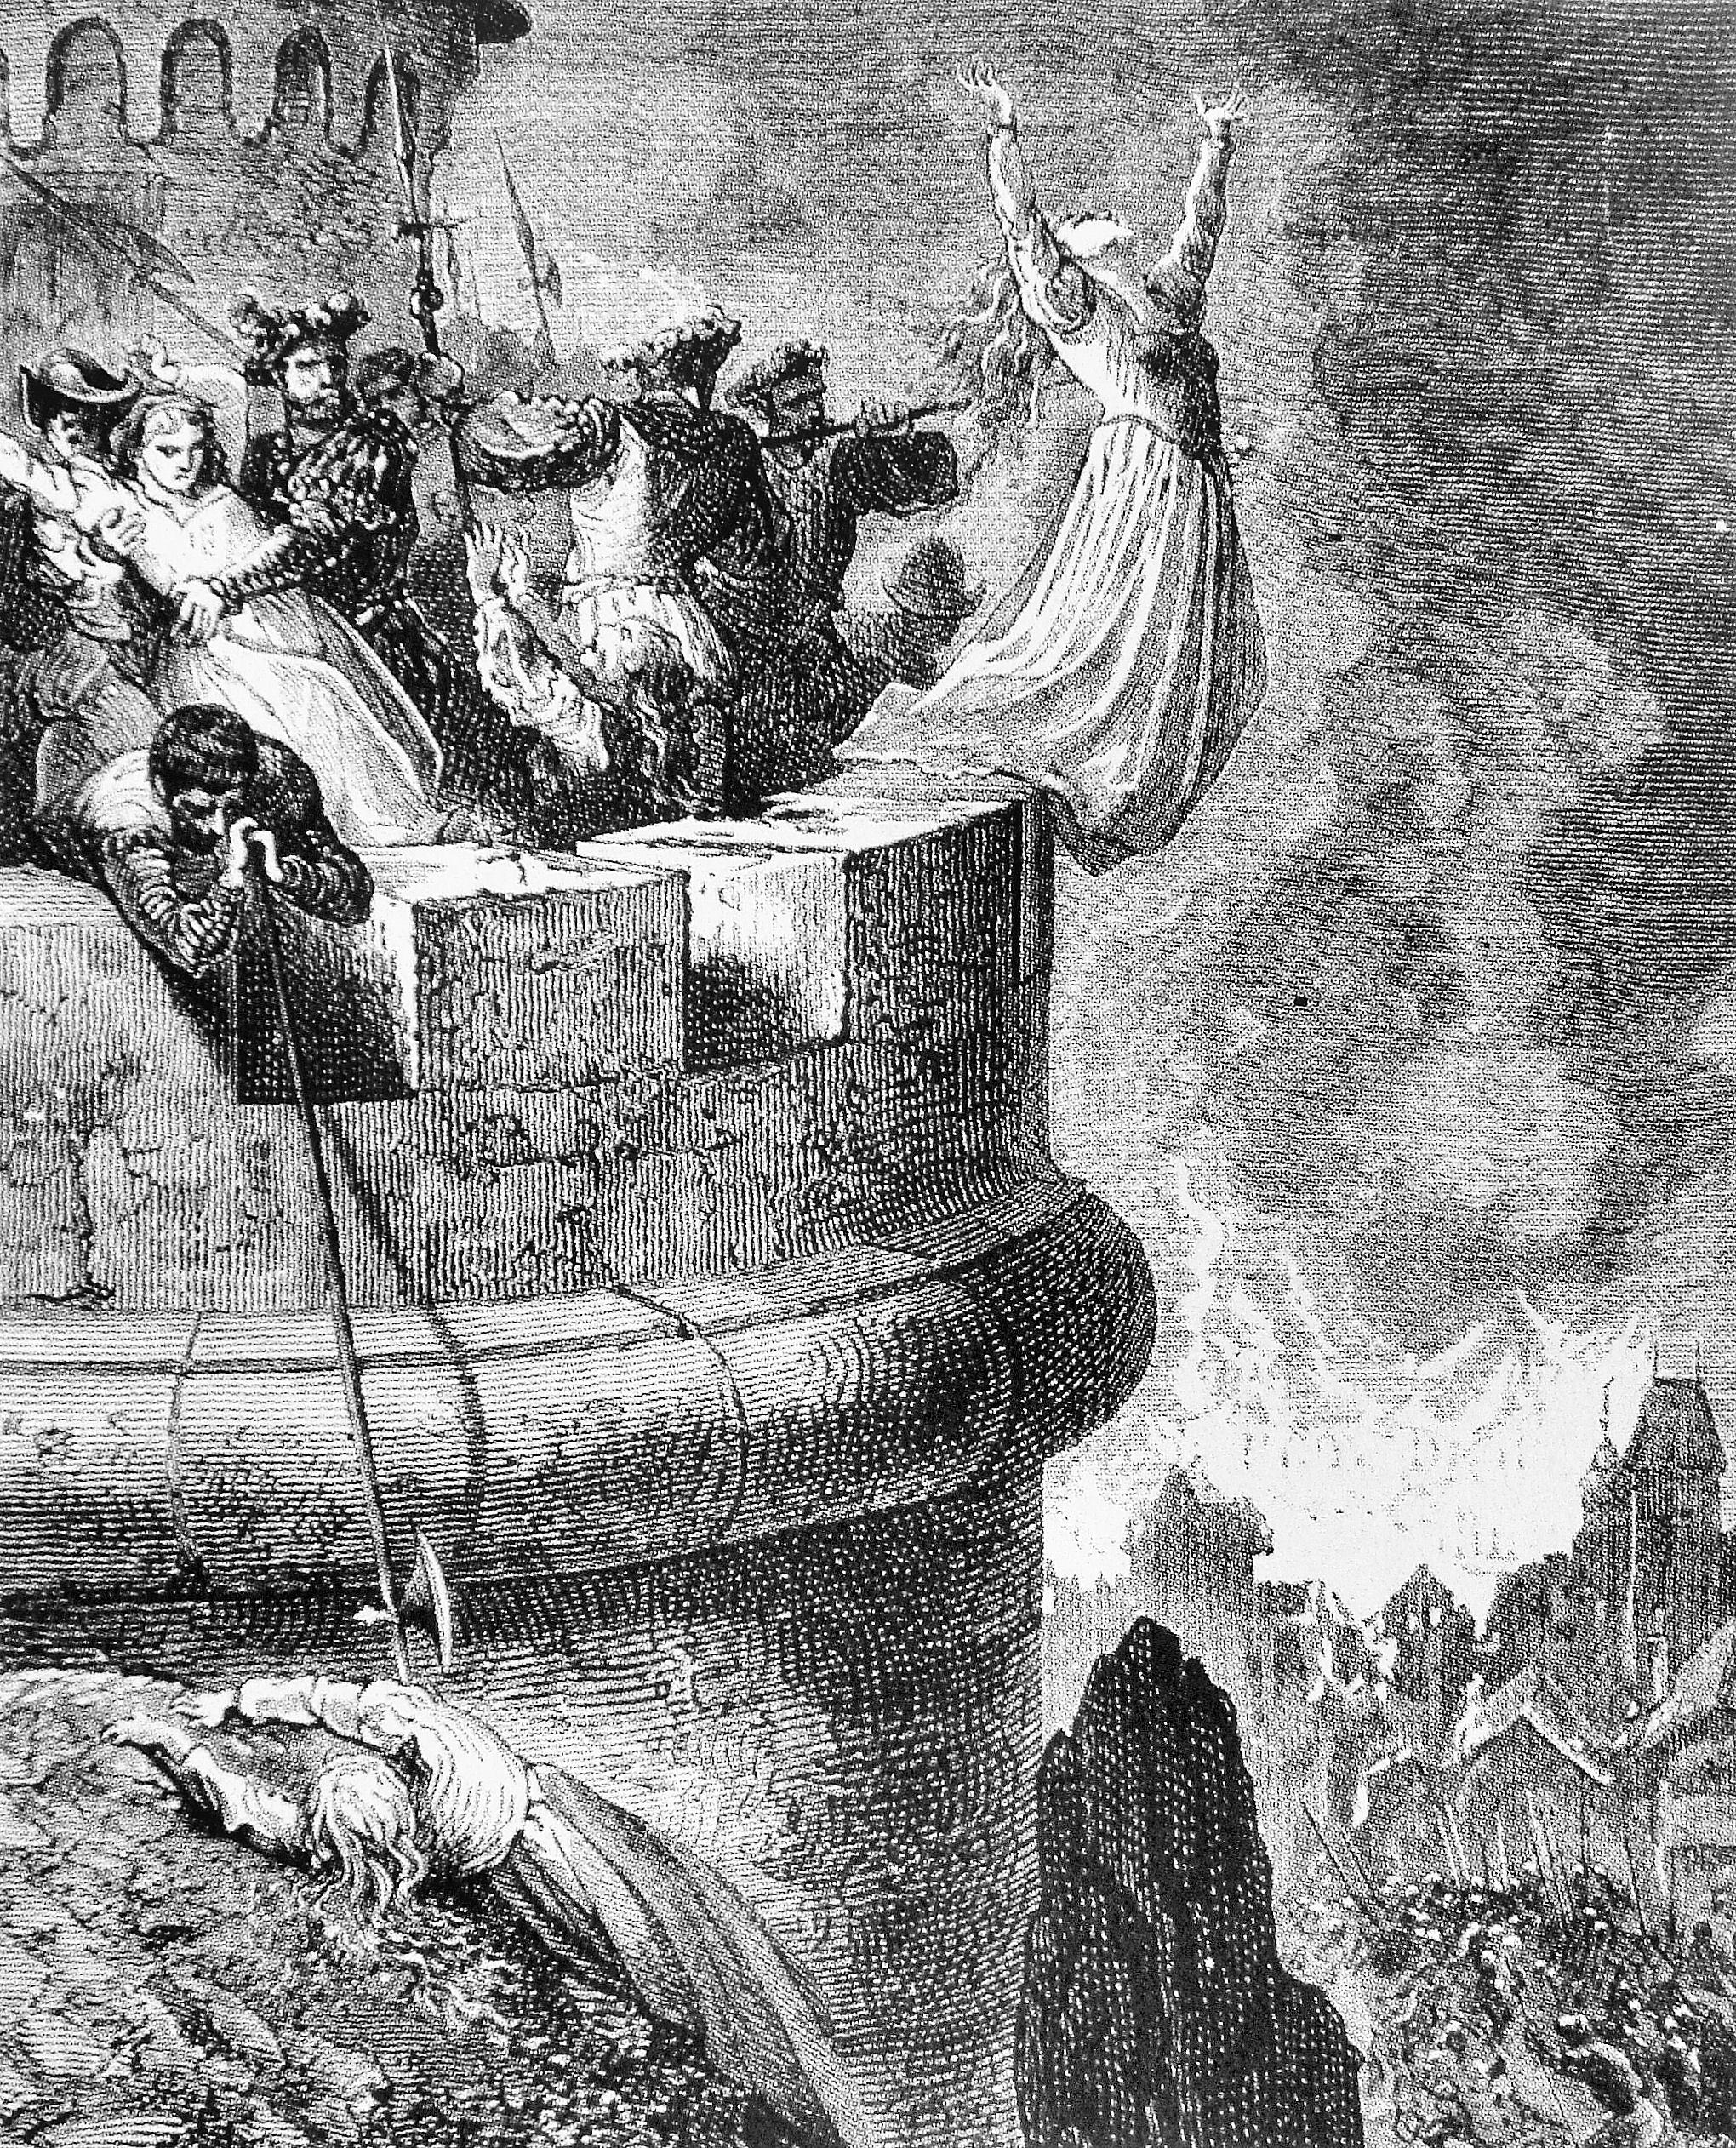 Massacre of the Waldensians of Mérindol in 1545.